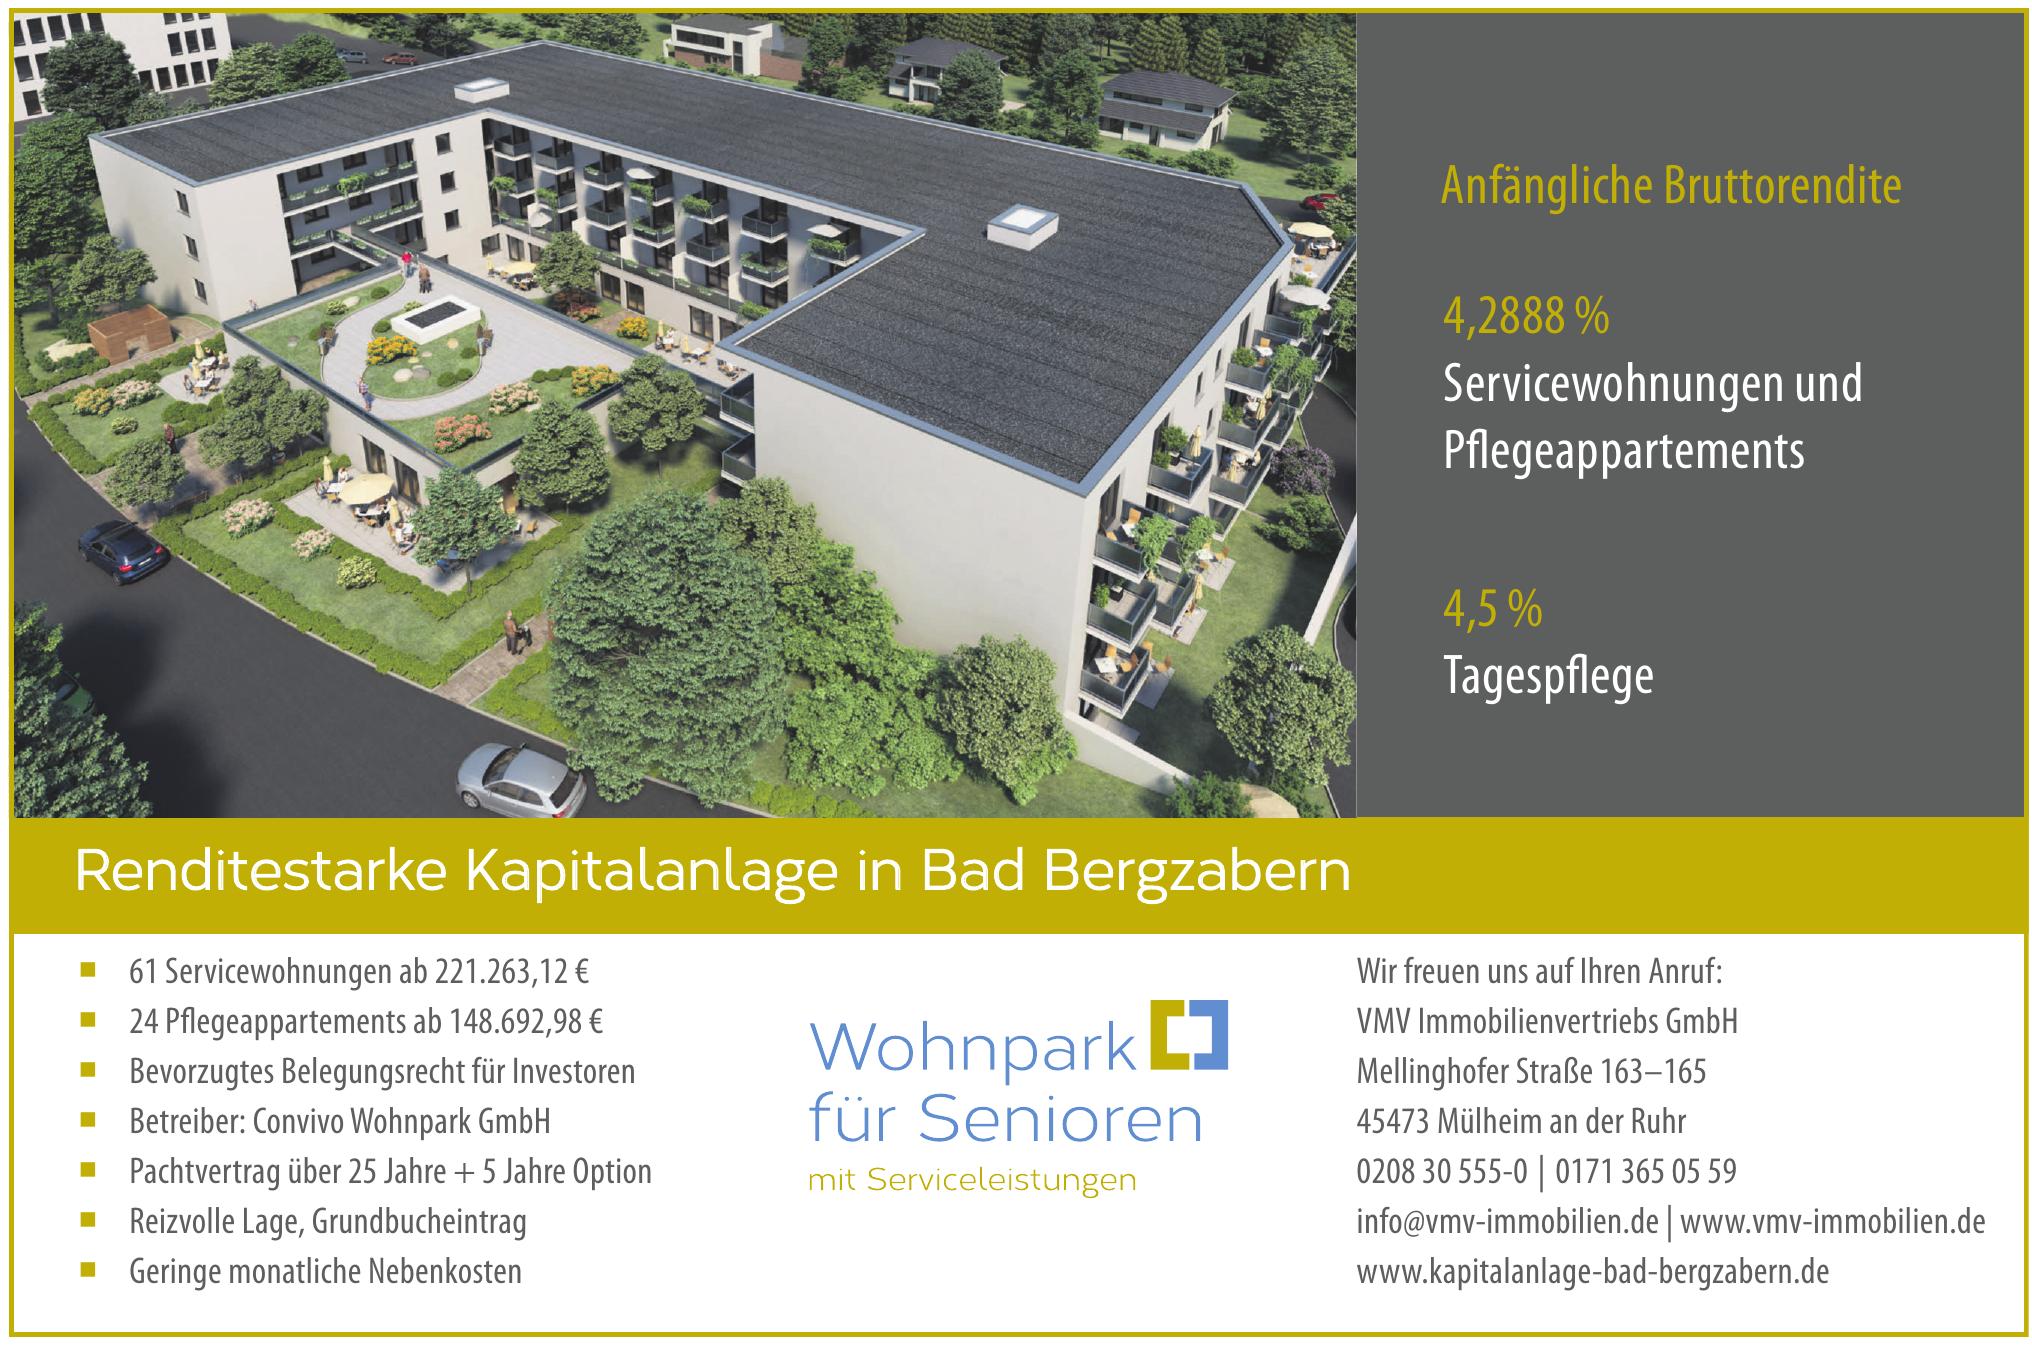 VMV Immobilienvertriebs GmbH